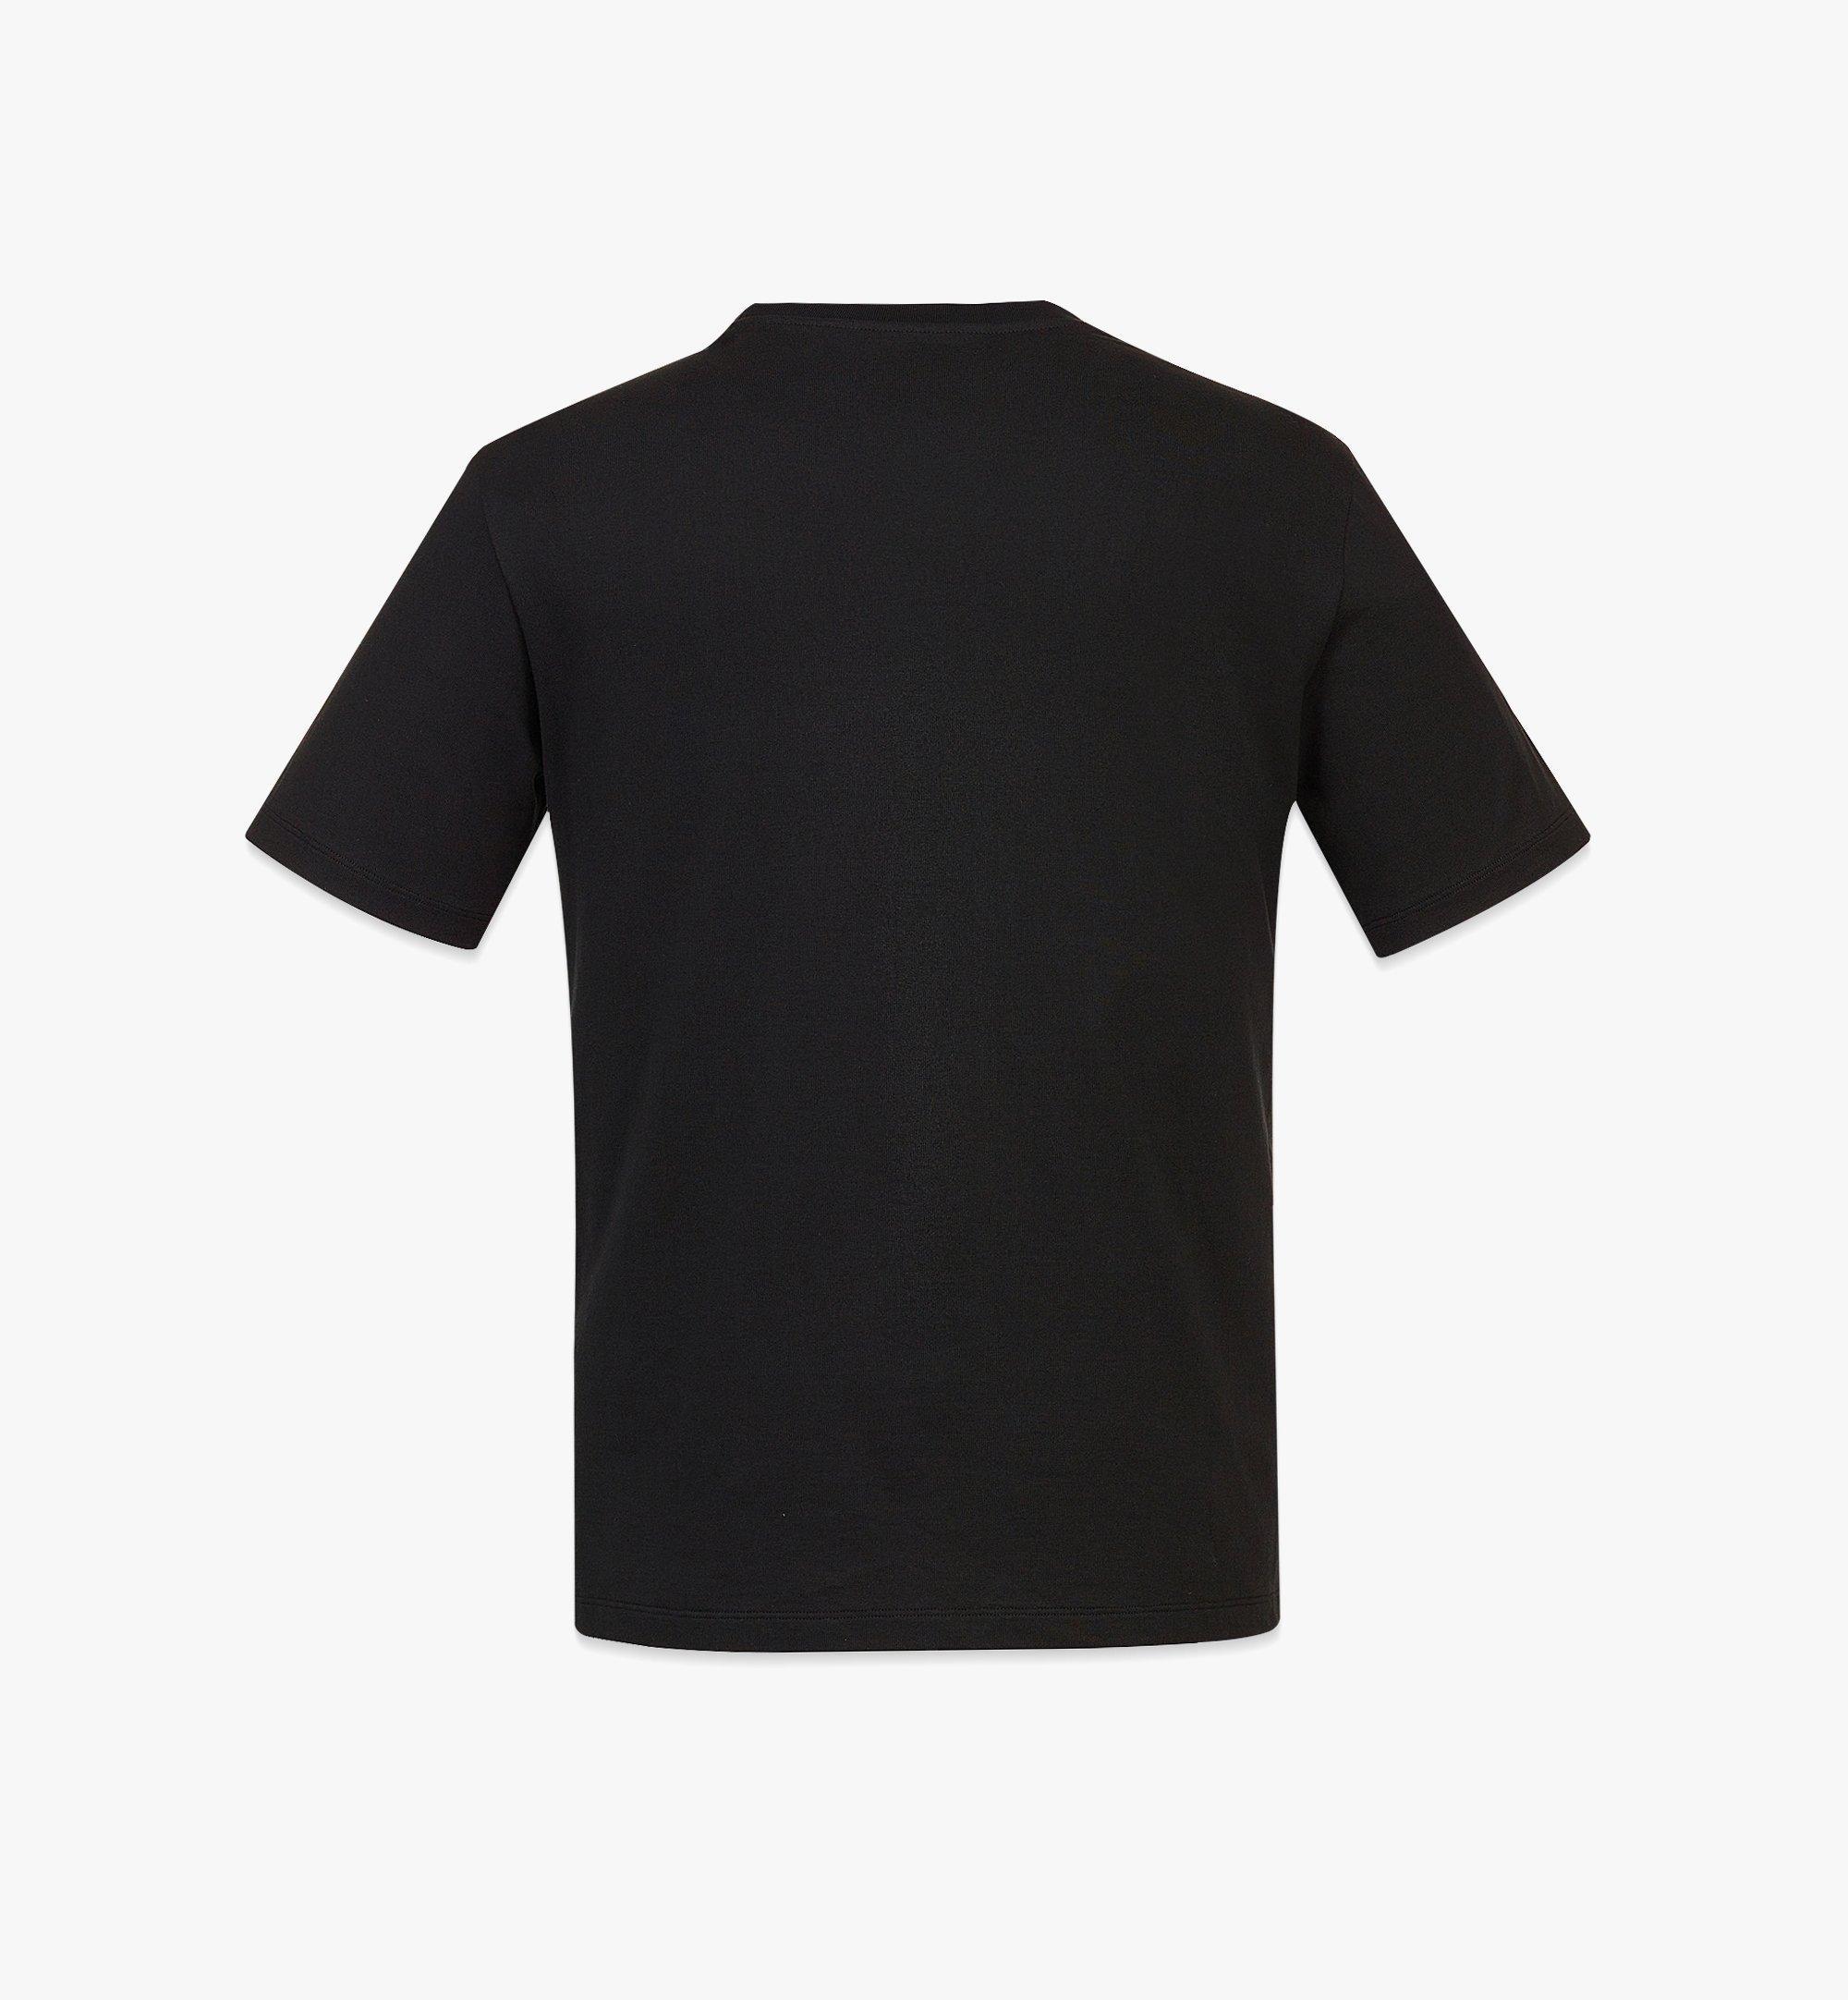 MCM メンズ MCM ロゴ Tシャツ Black MHTBAMM01BK00L ほかの角度から見る 1